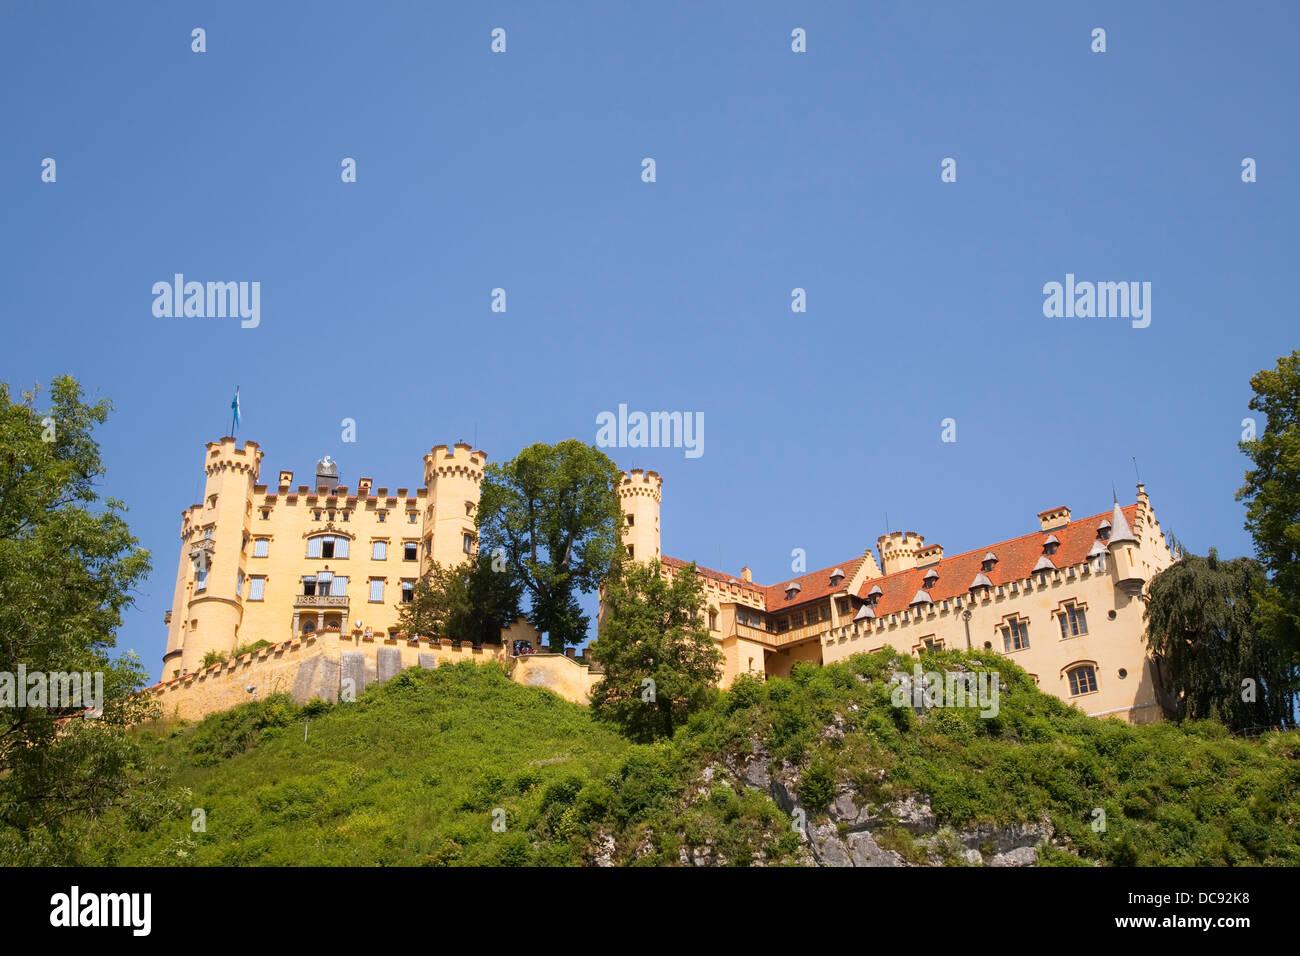 Europe, Germany, Bavaria, Schwangau, Hohenschwangau Castle - Stock Image